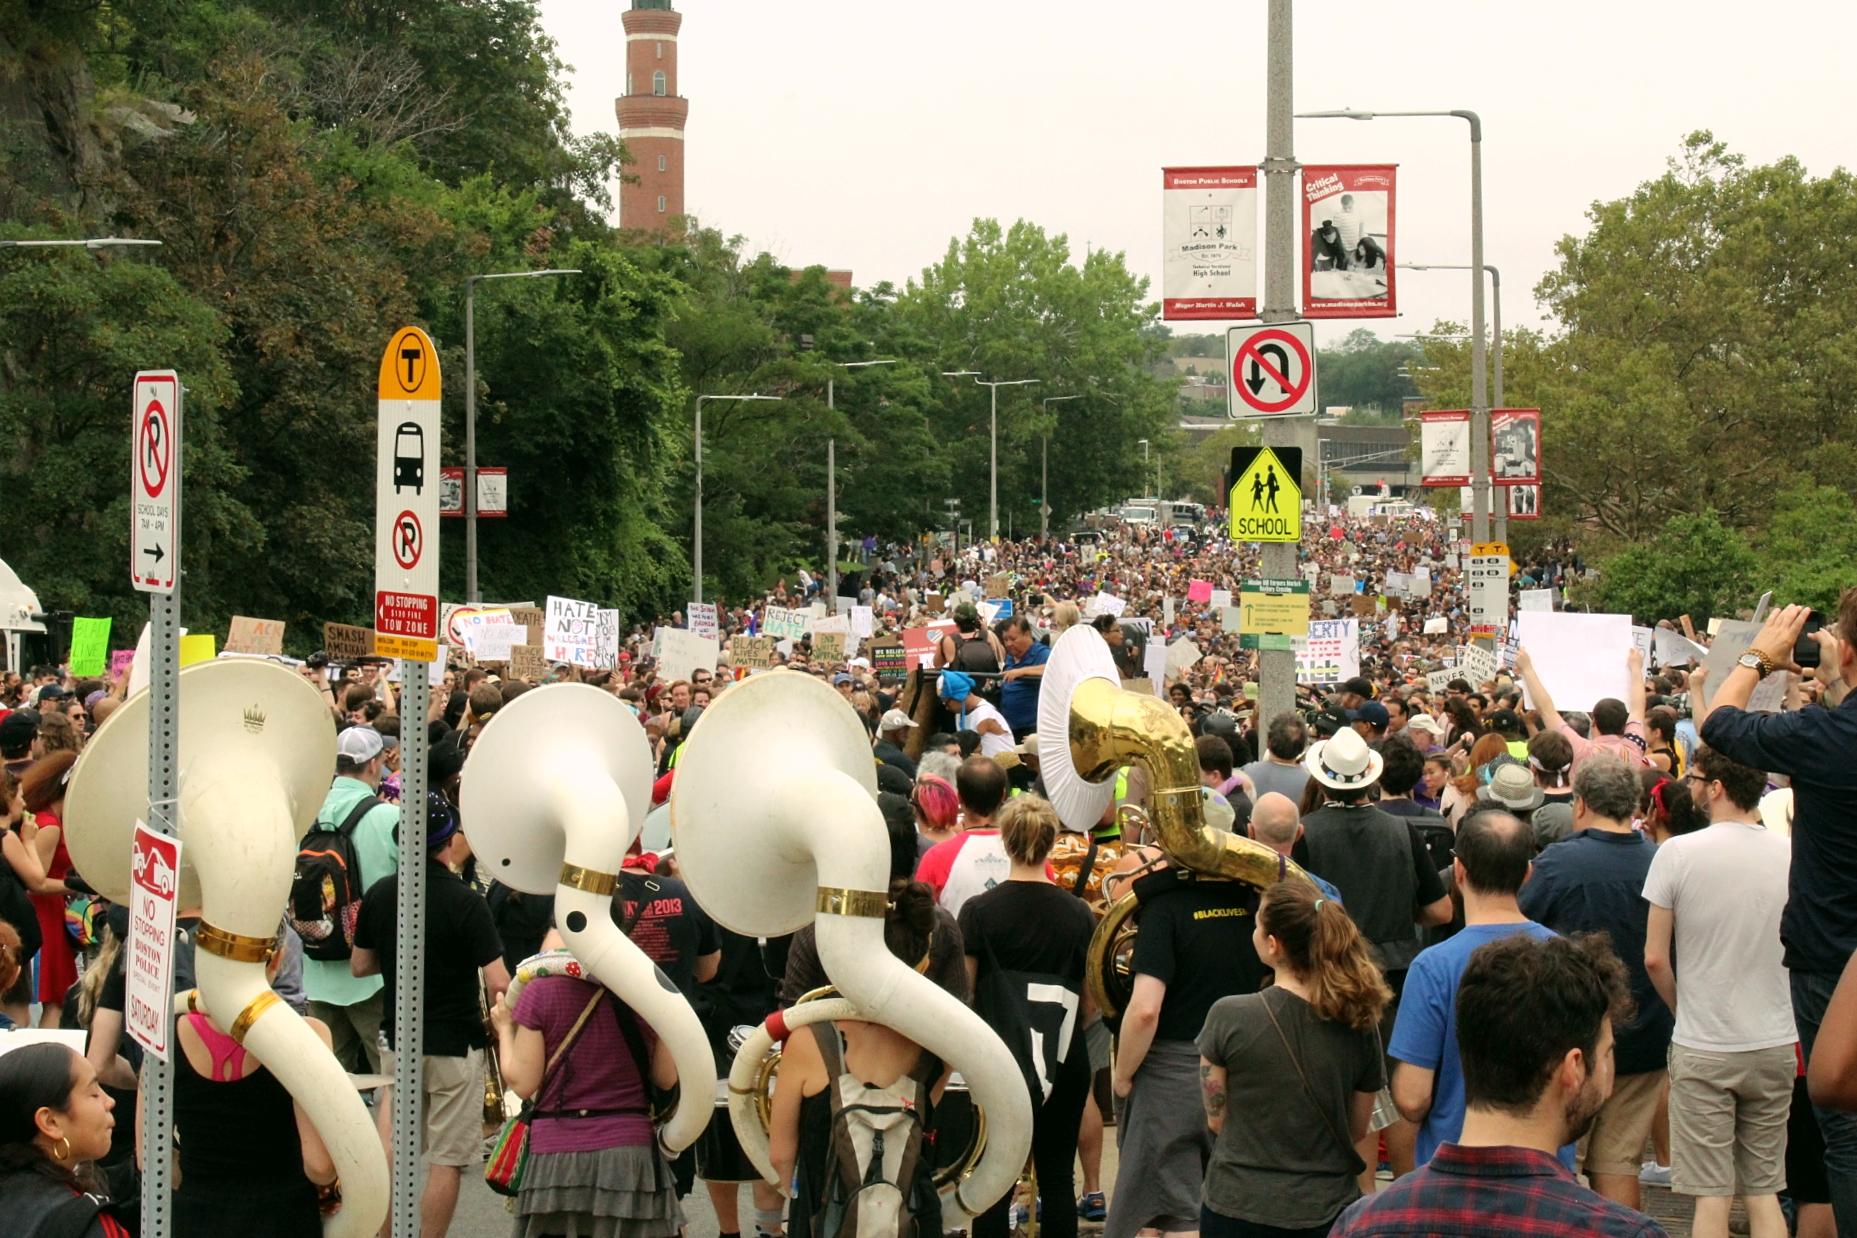 2017-08-19 Boston Free Speech 01